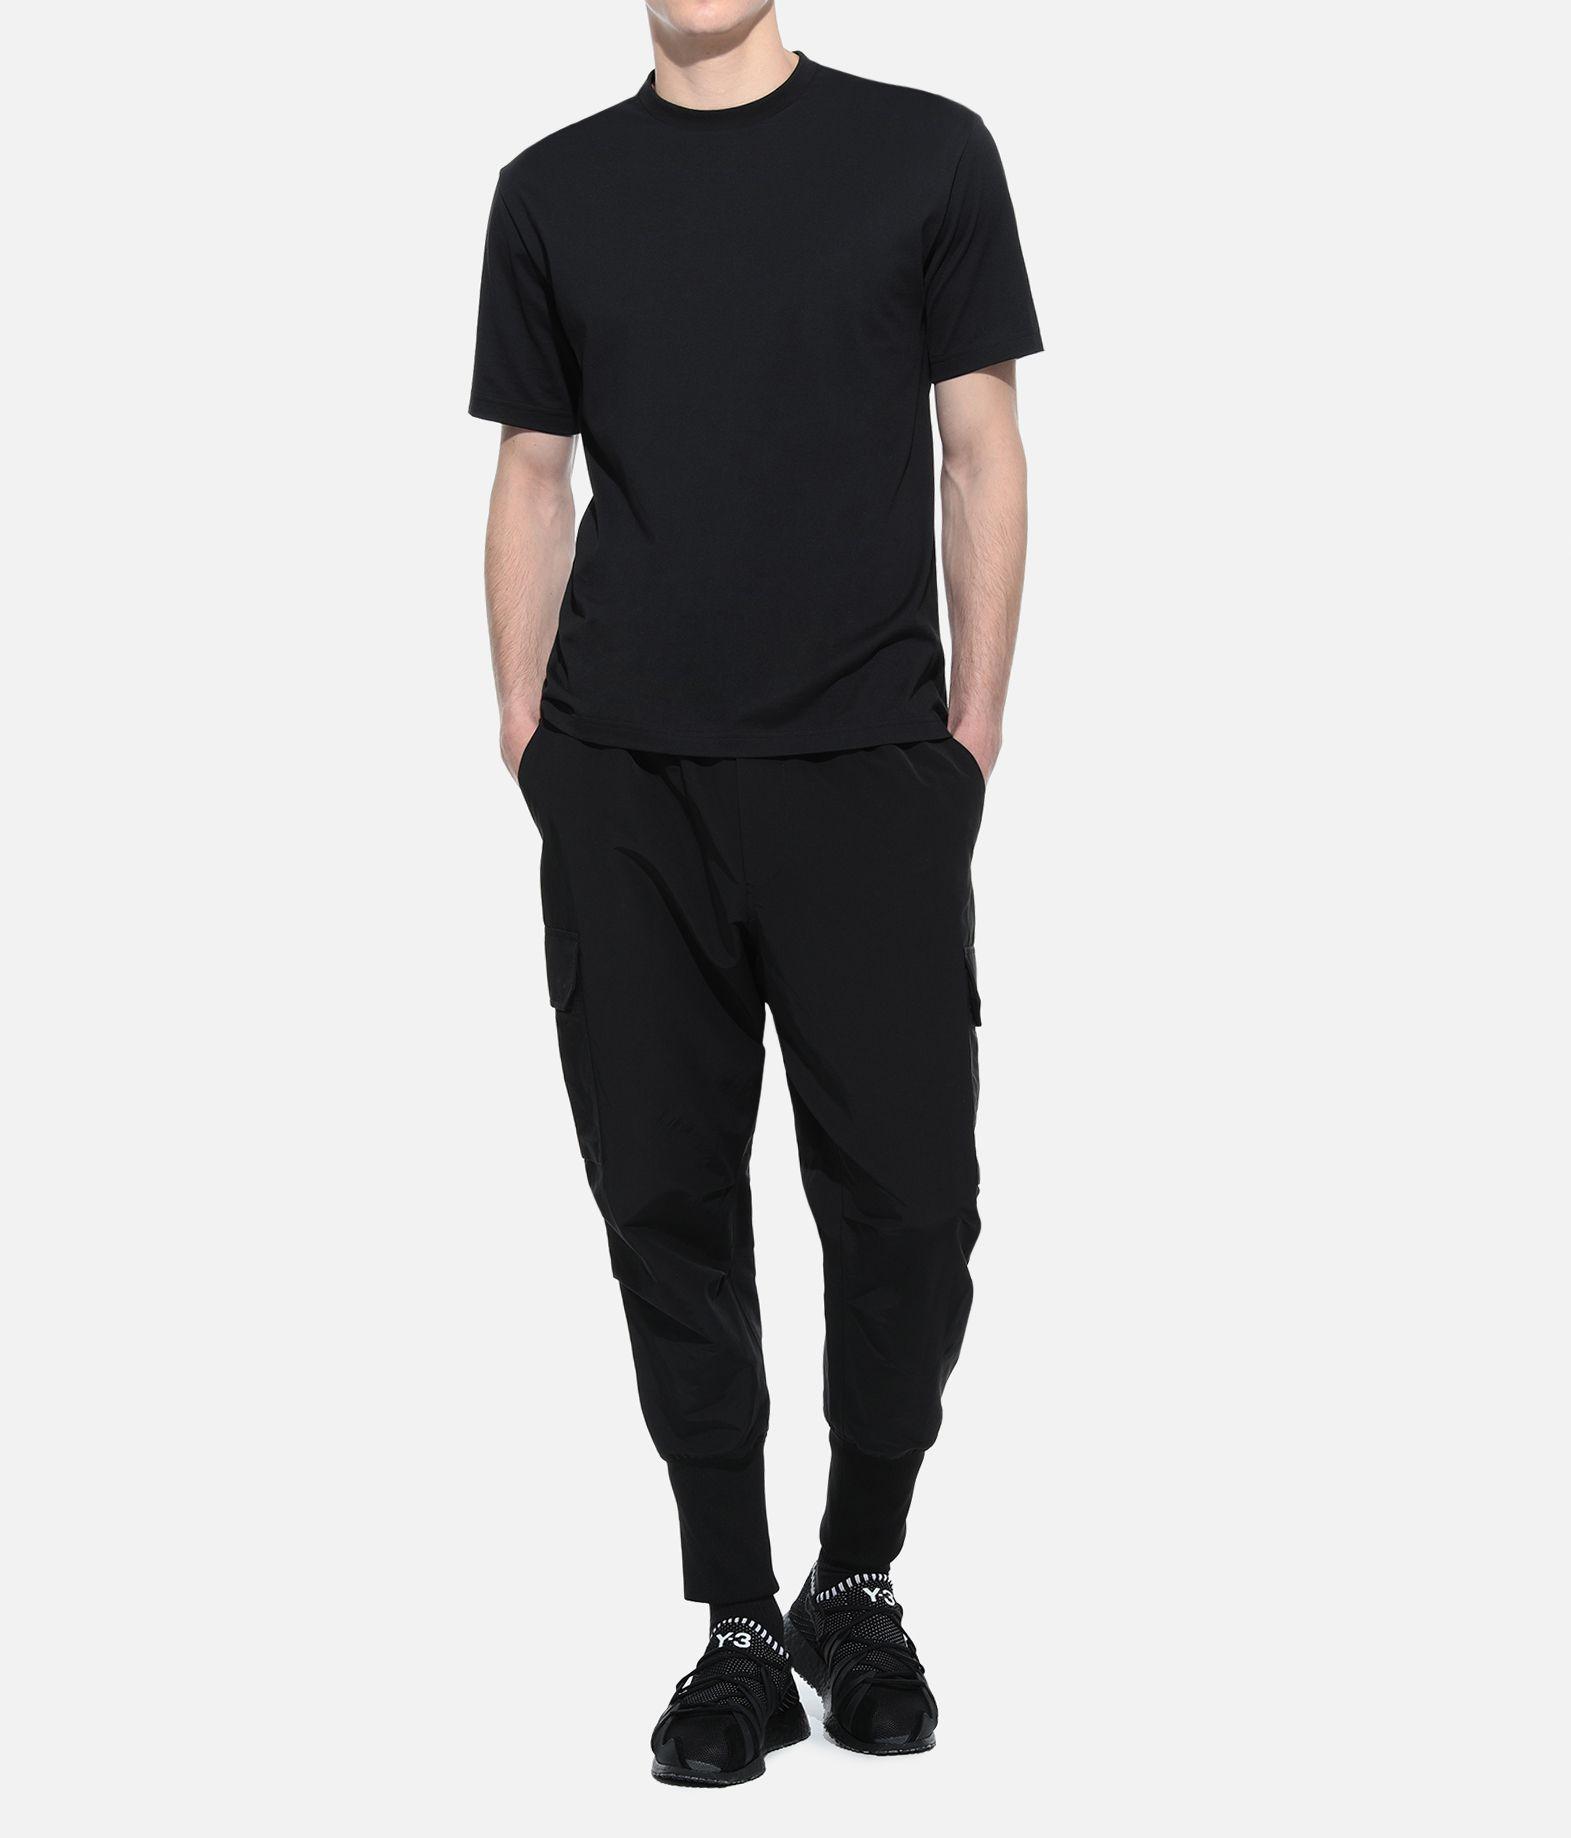 Y-3 Y-3 Toketa Print Tee Short sleeve t-shirt Man a